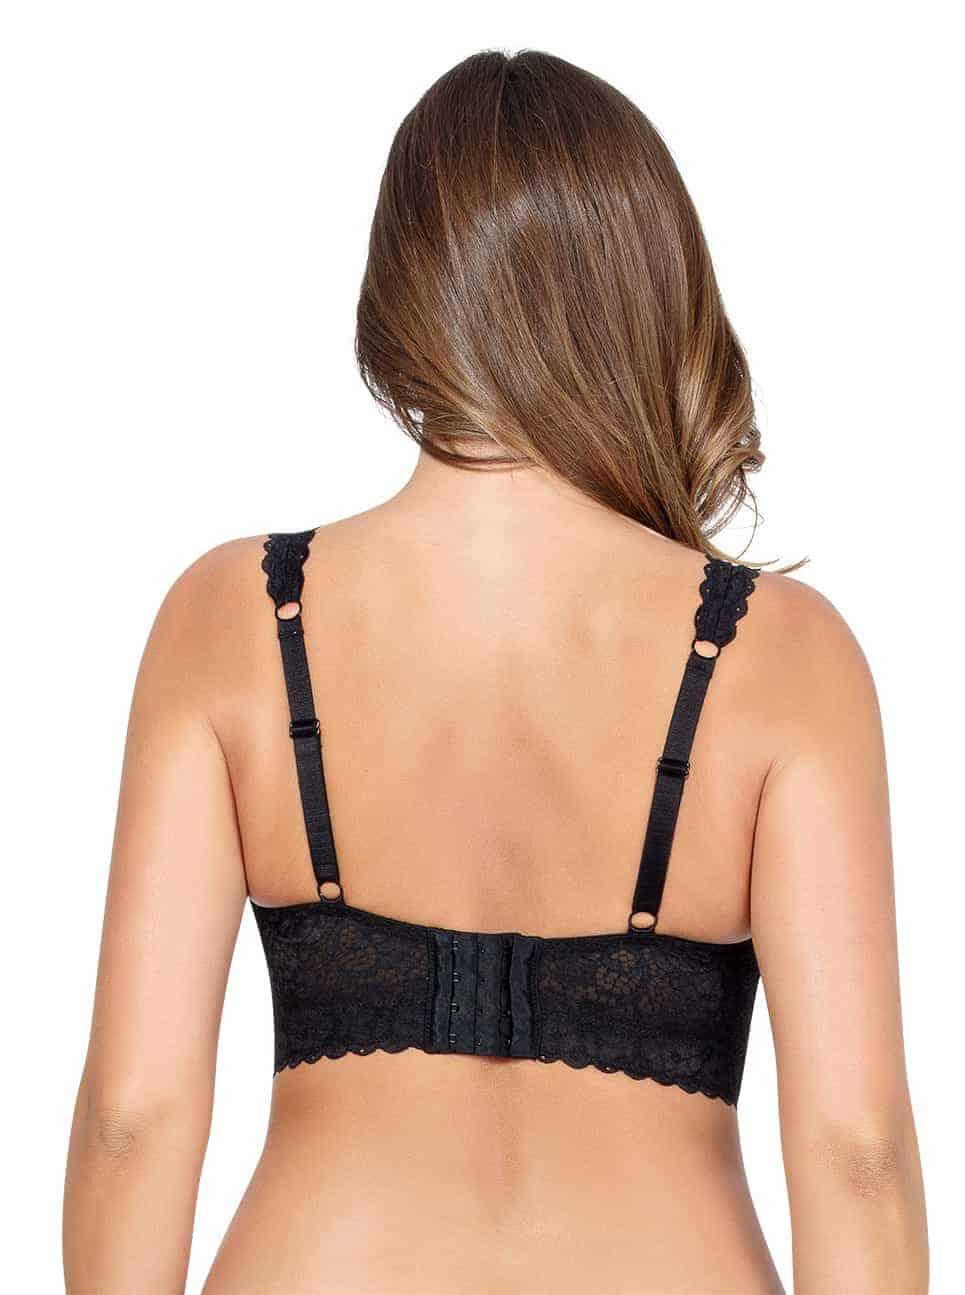 Базовое белье PARFAIT_Adriana_LaceBraletteP5482_Black_Back